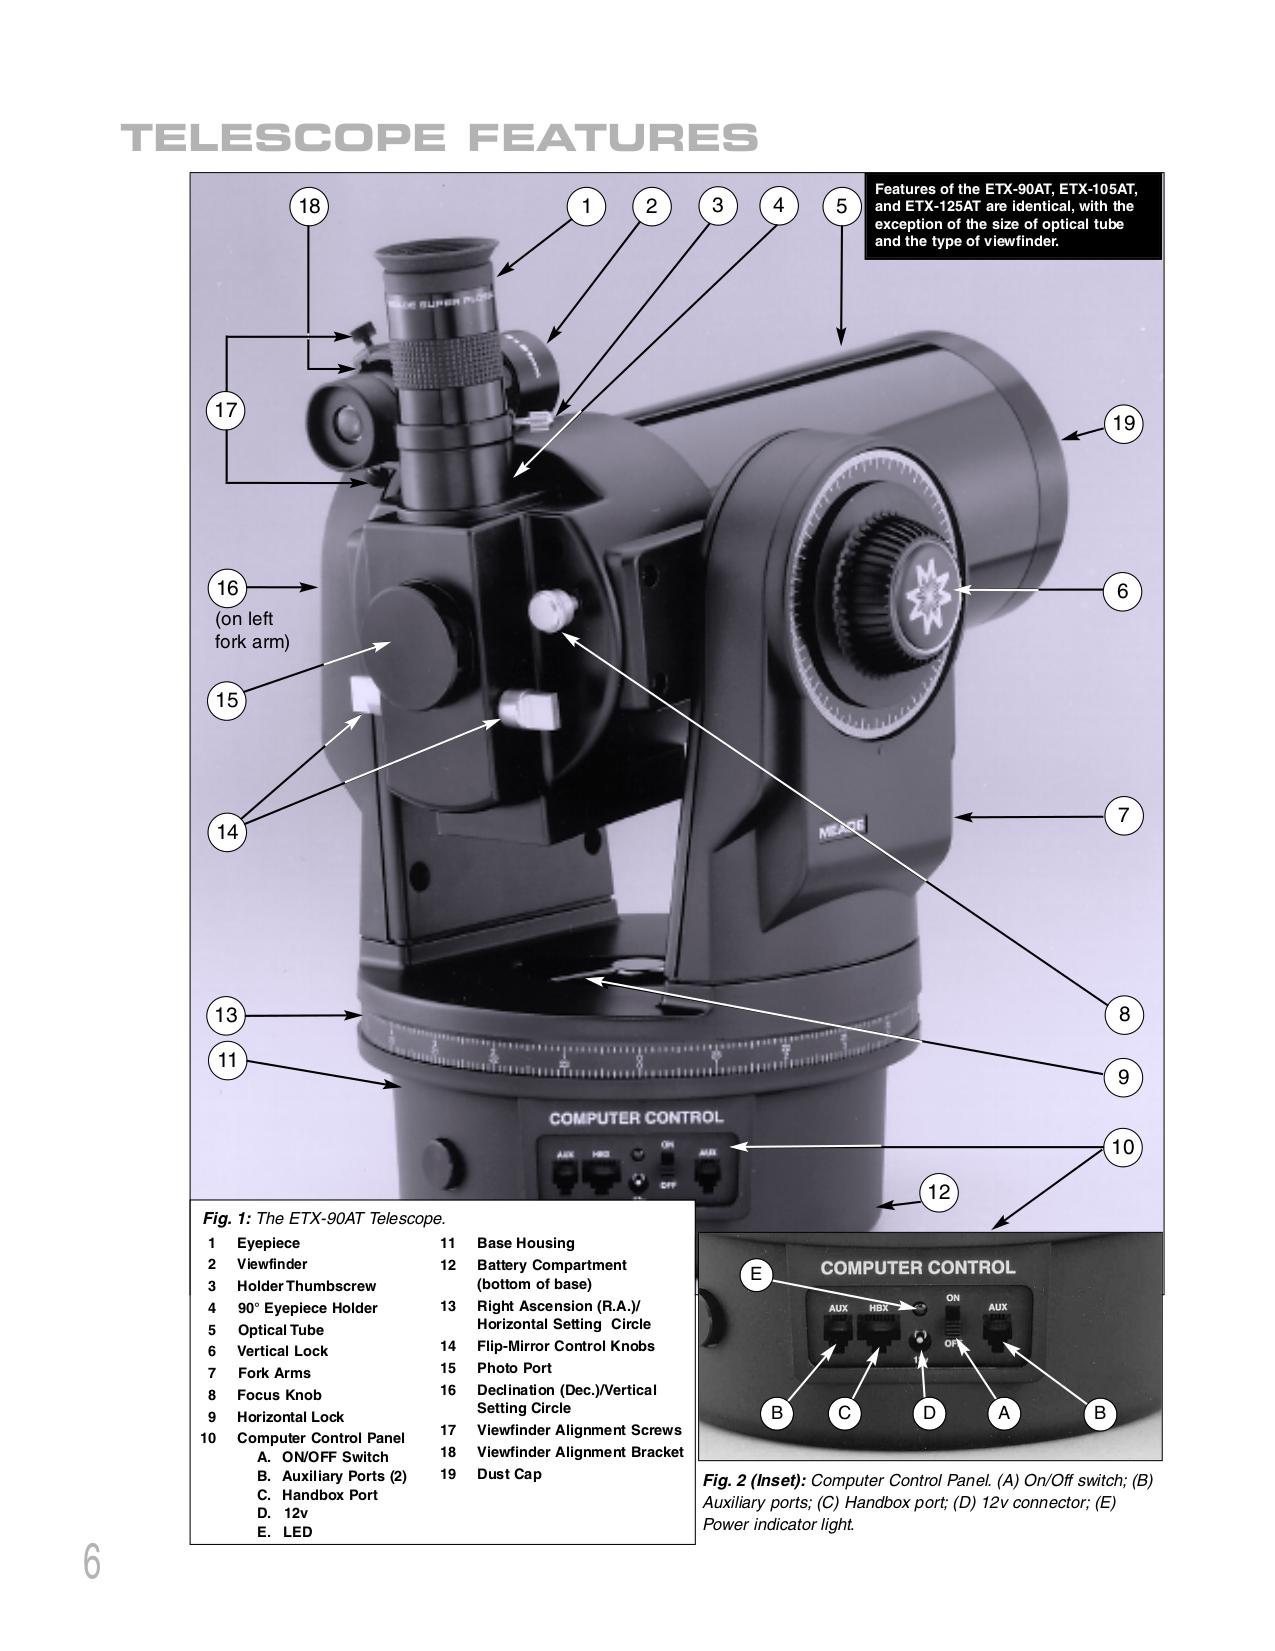 Ebook-6273] meade etx 90at telescopes owners manual | 2019 ebook.